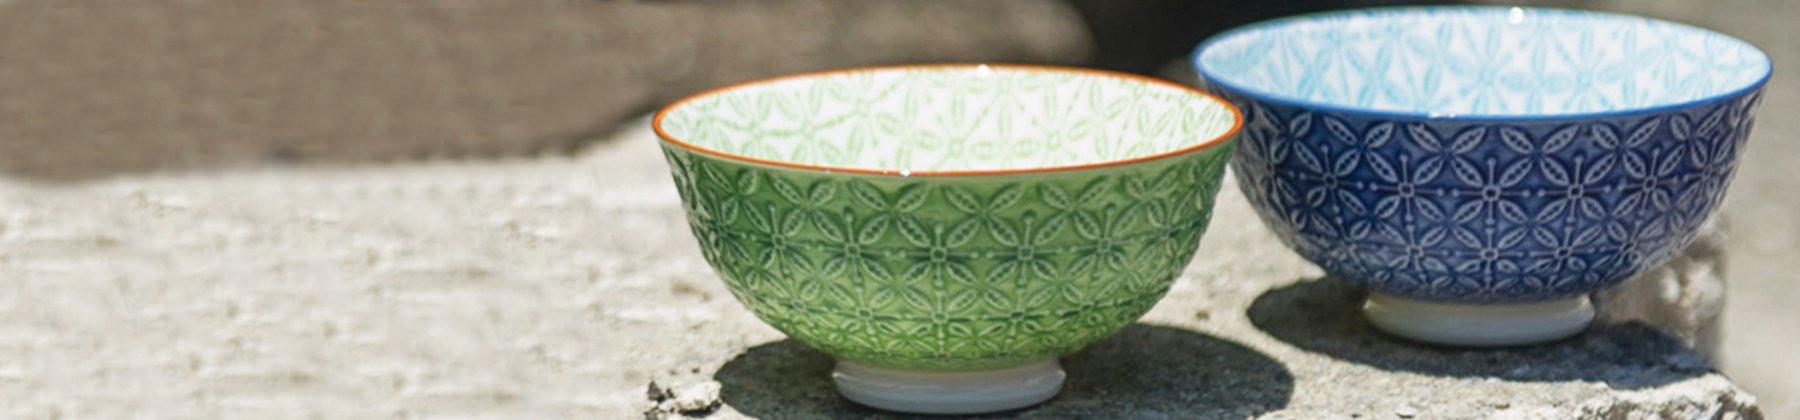 Cordon Bleu International Stoneware Oval Baker